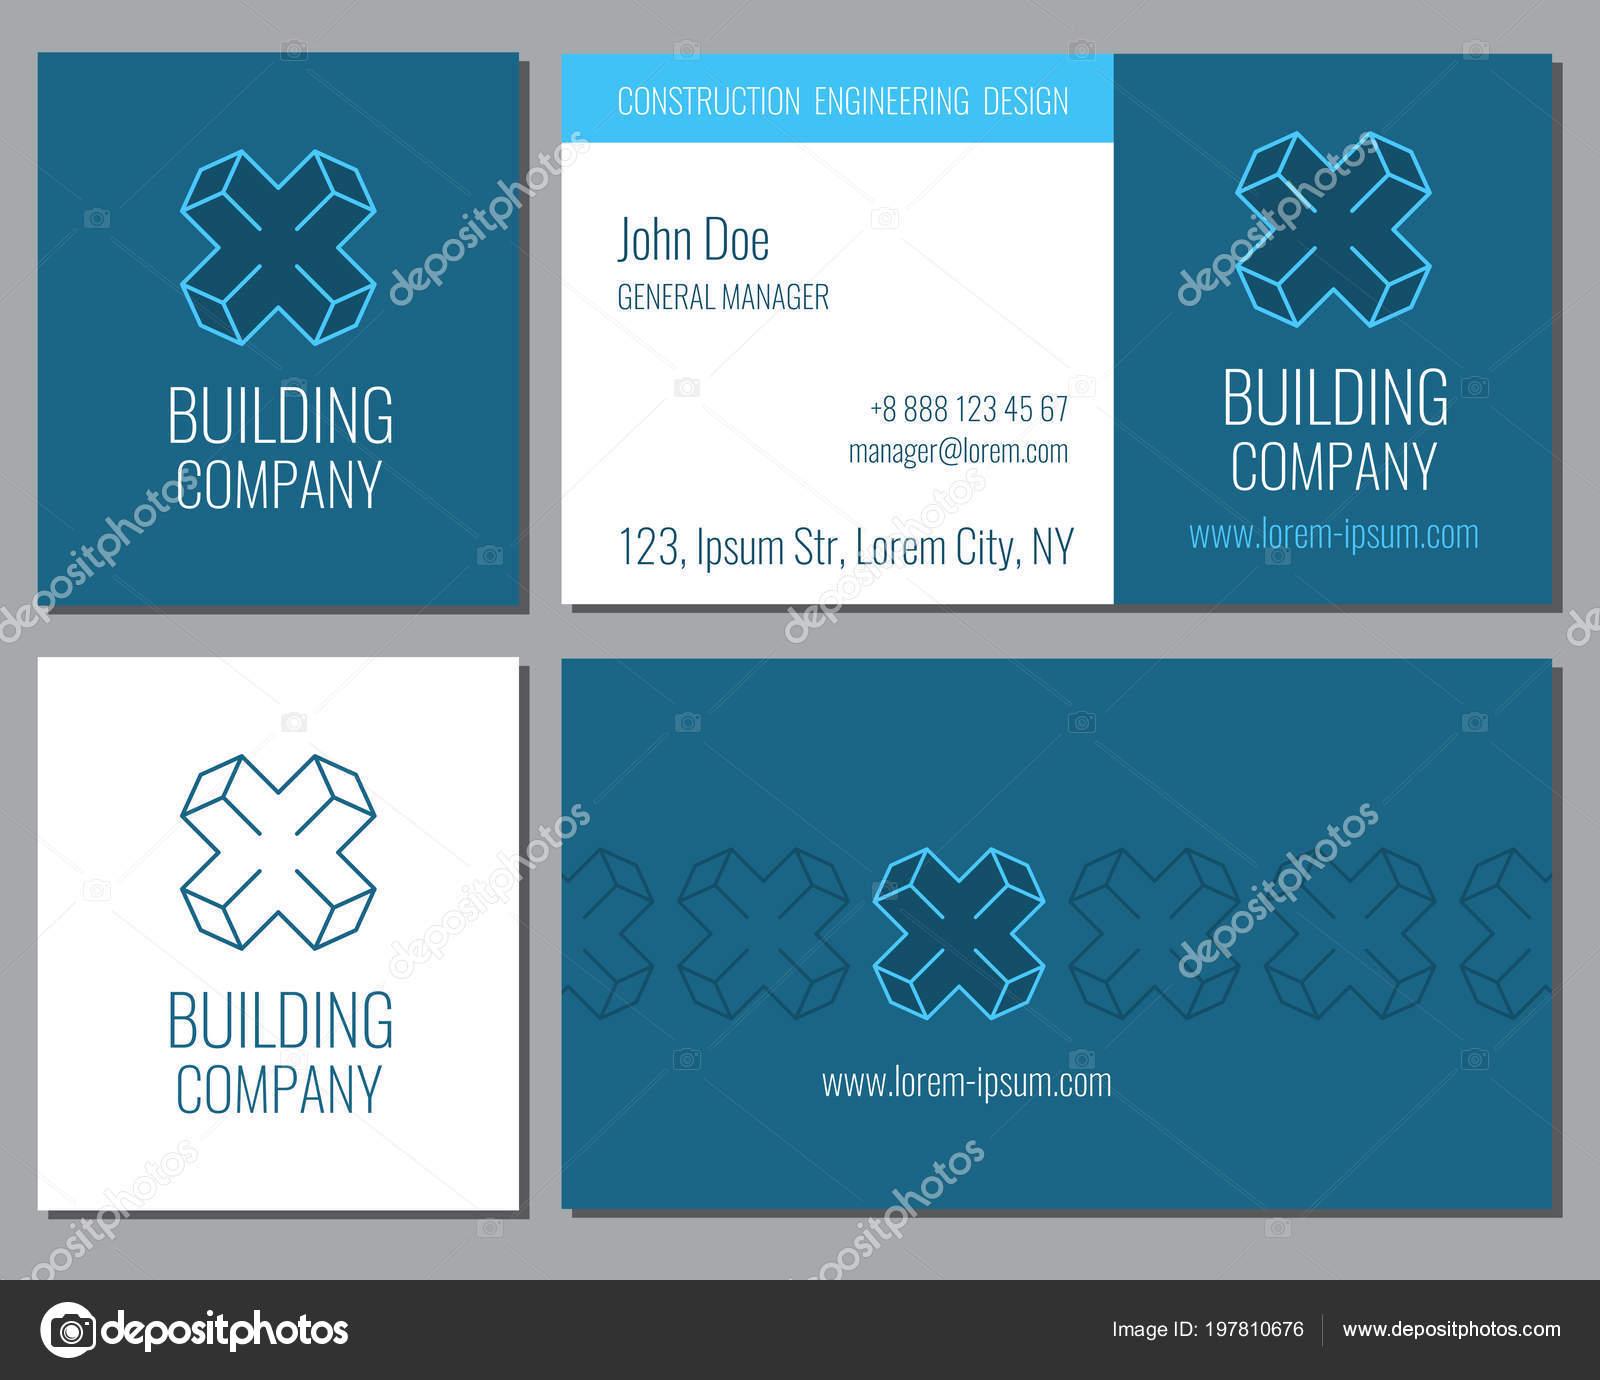 Kreative Visitenkarte Vektor Vorlage Mit Corporate Sechseck